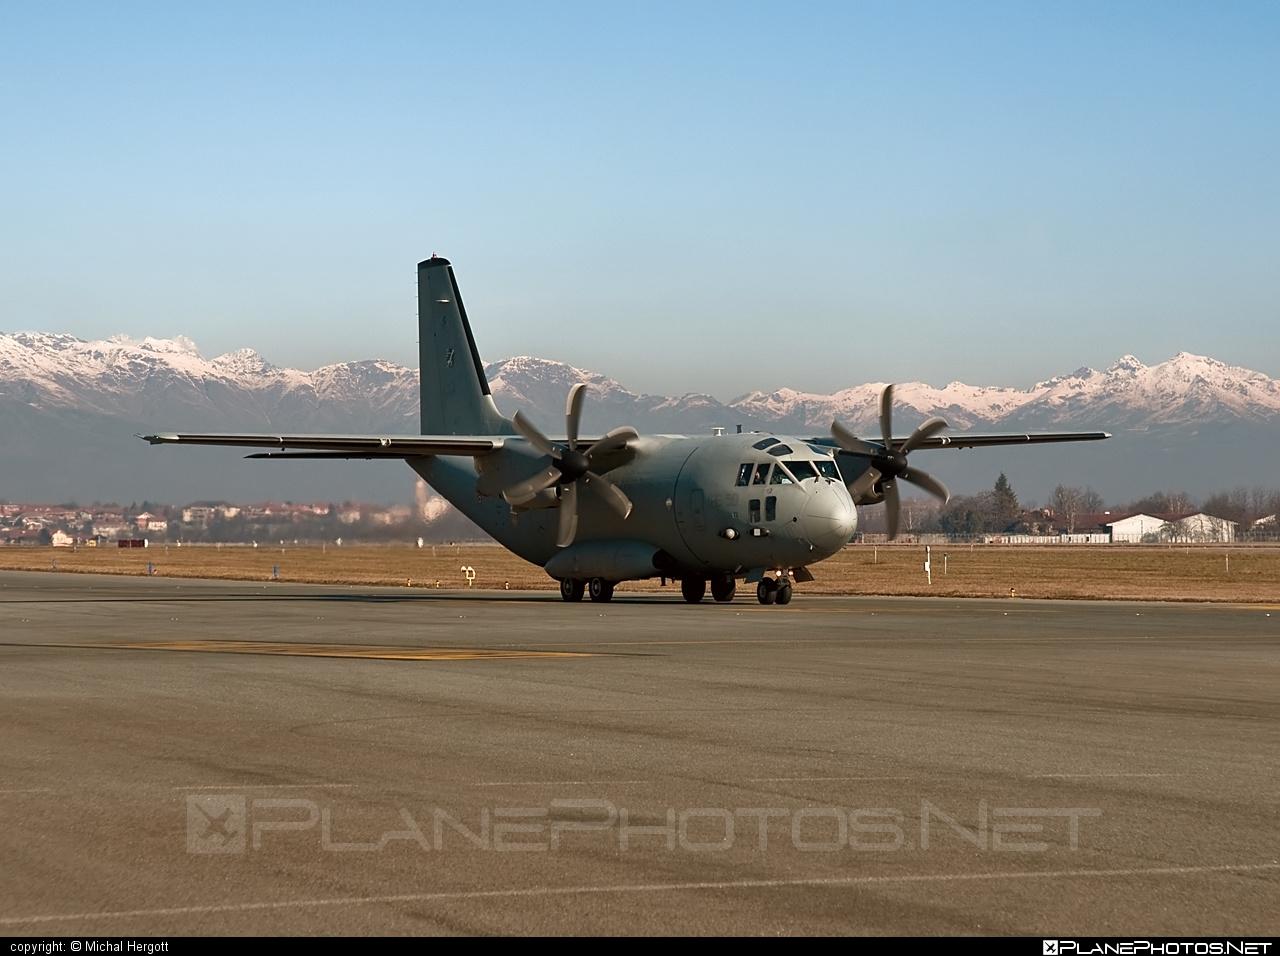 Alenia C-27J Spartan - CSX62219 operated by Aeronautica Militare (Italian Air Force) #alenia #aleniac27j #aleniac27jspartan #aleniaspartan #c27j #c27jspartan #c27spartan